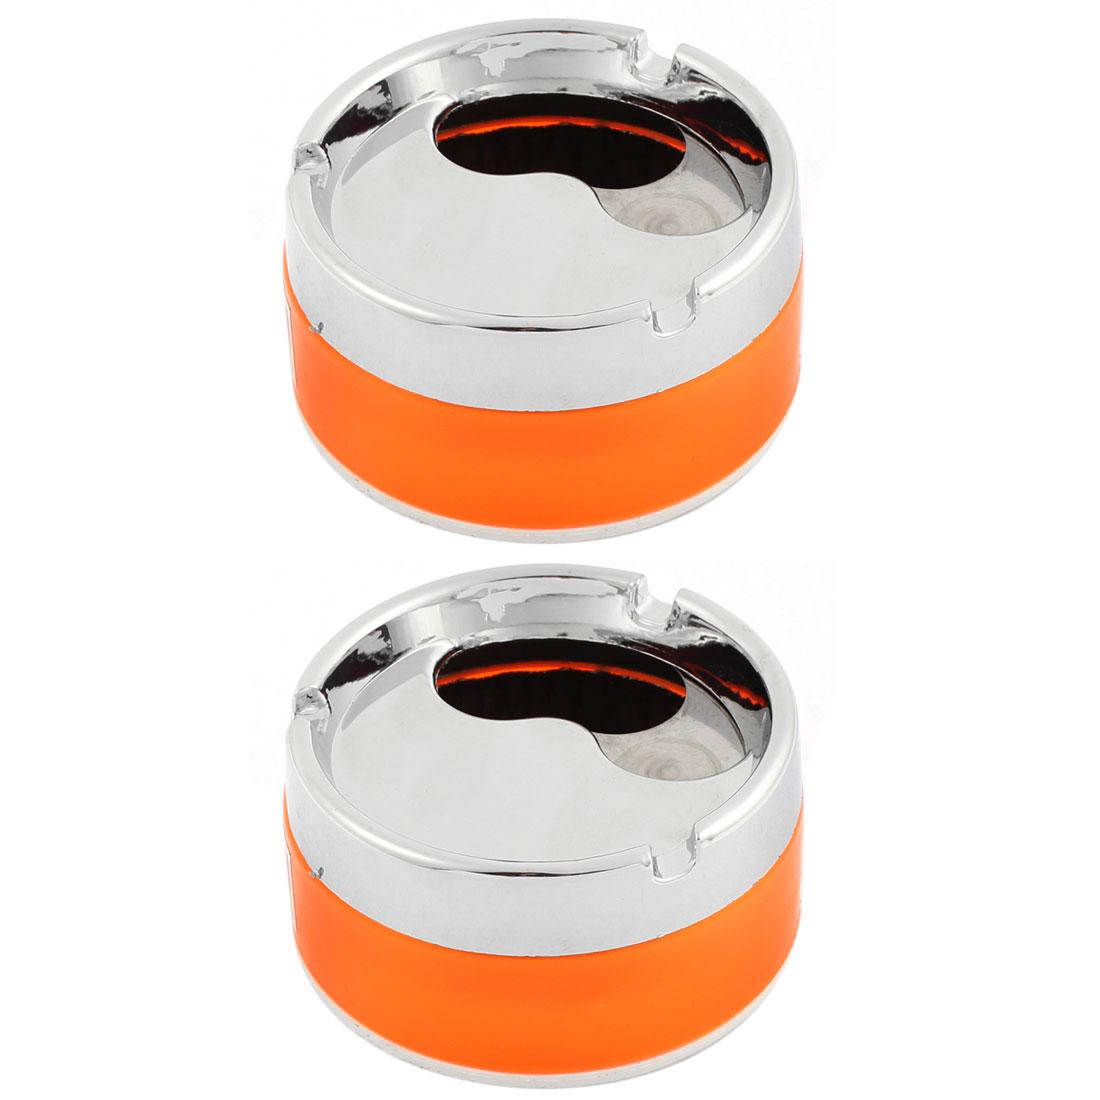 Home Car Cylinder Shaped Rotatable Lid Cigarette Holder Ashtray Orange 85mm Dia 2pcs